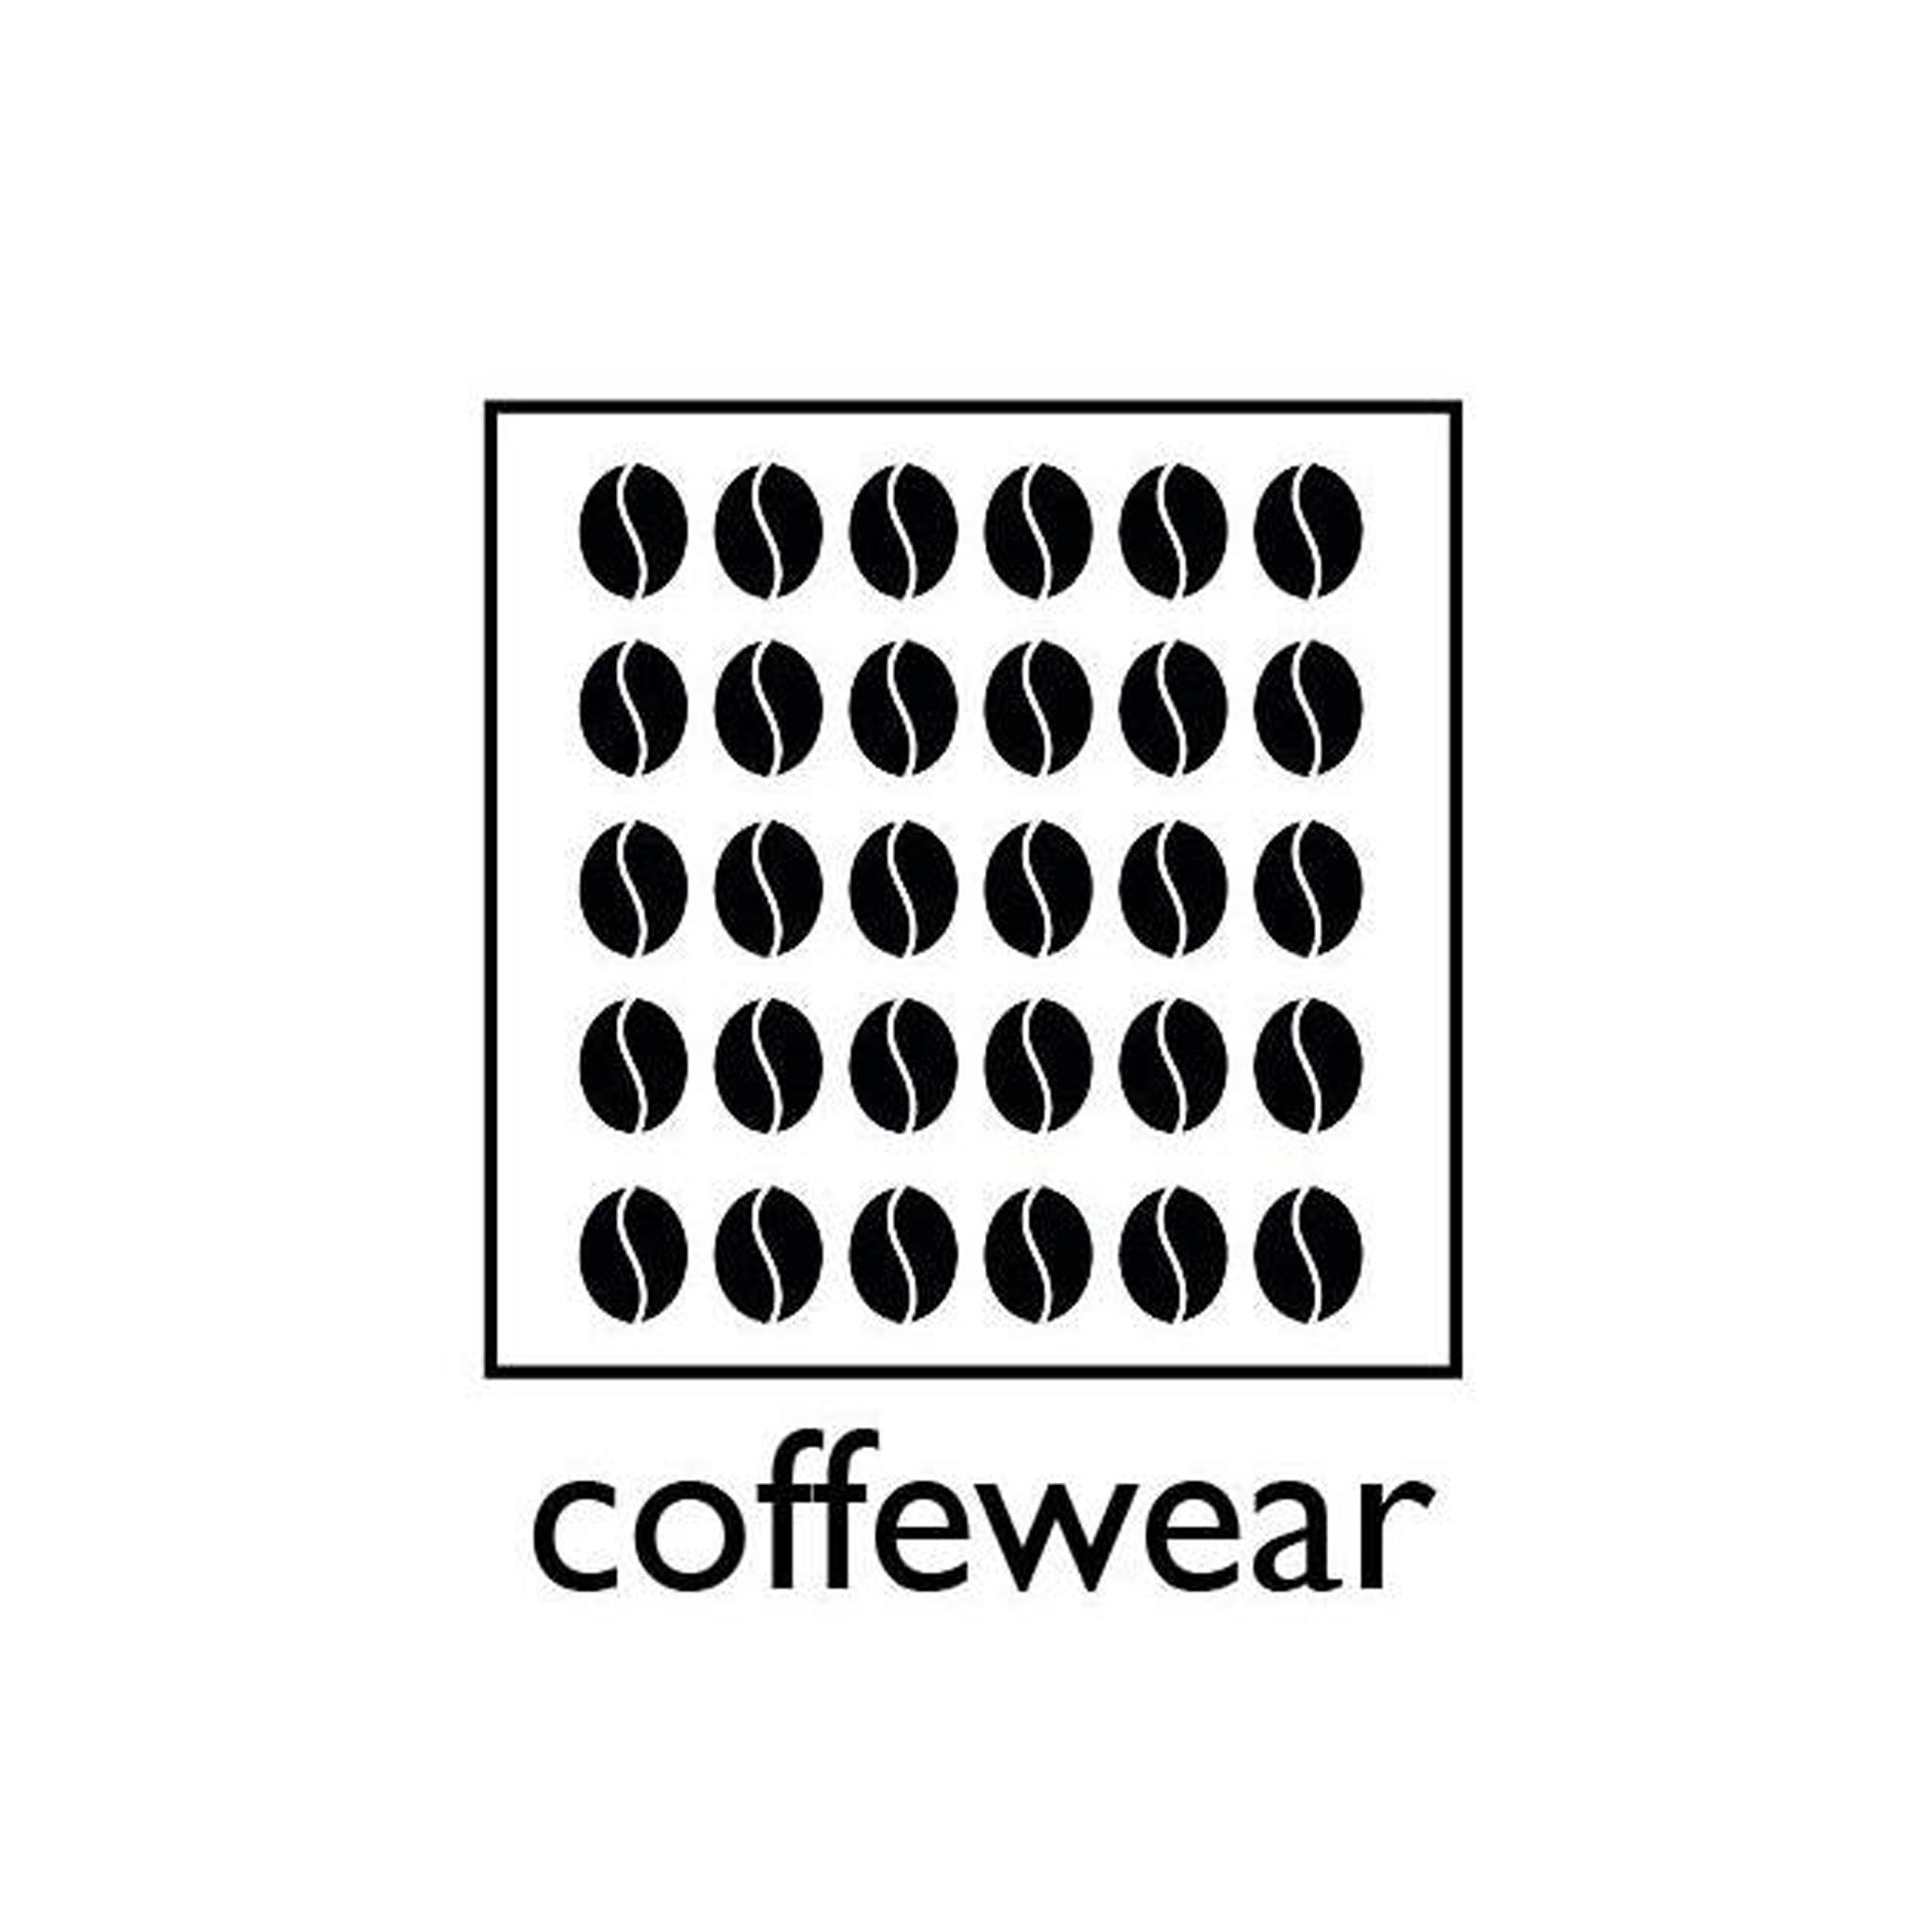 Coffewear